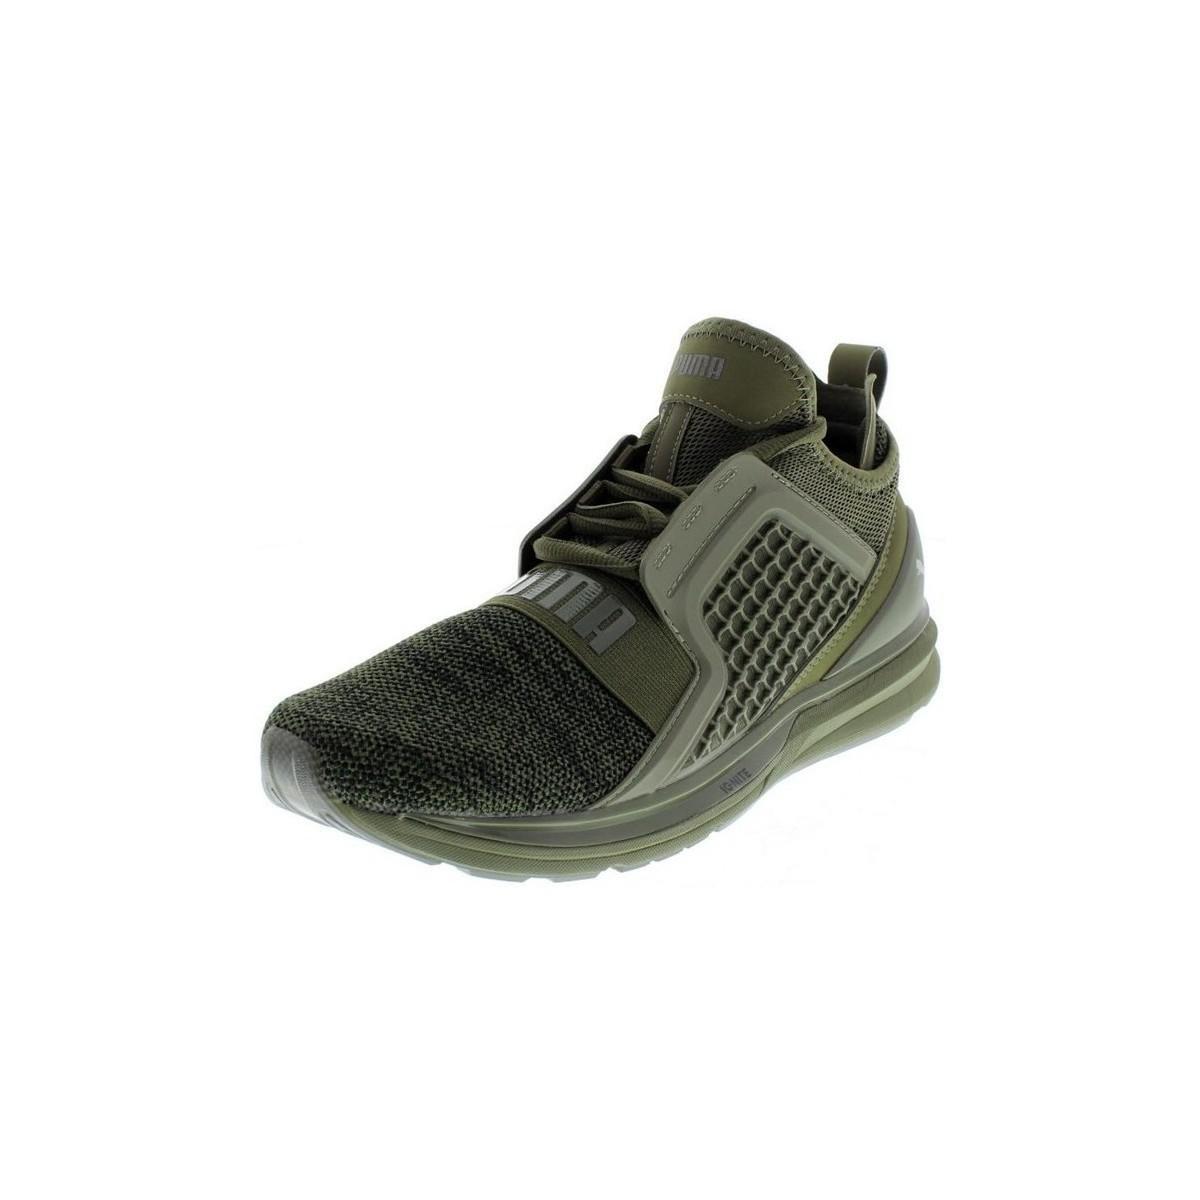 78f94671e880 Puma Ignite Men s Shoes (high-top Trainers) In Multicolour in Green ...